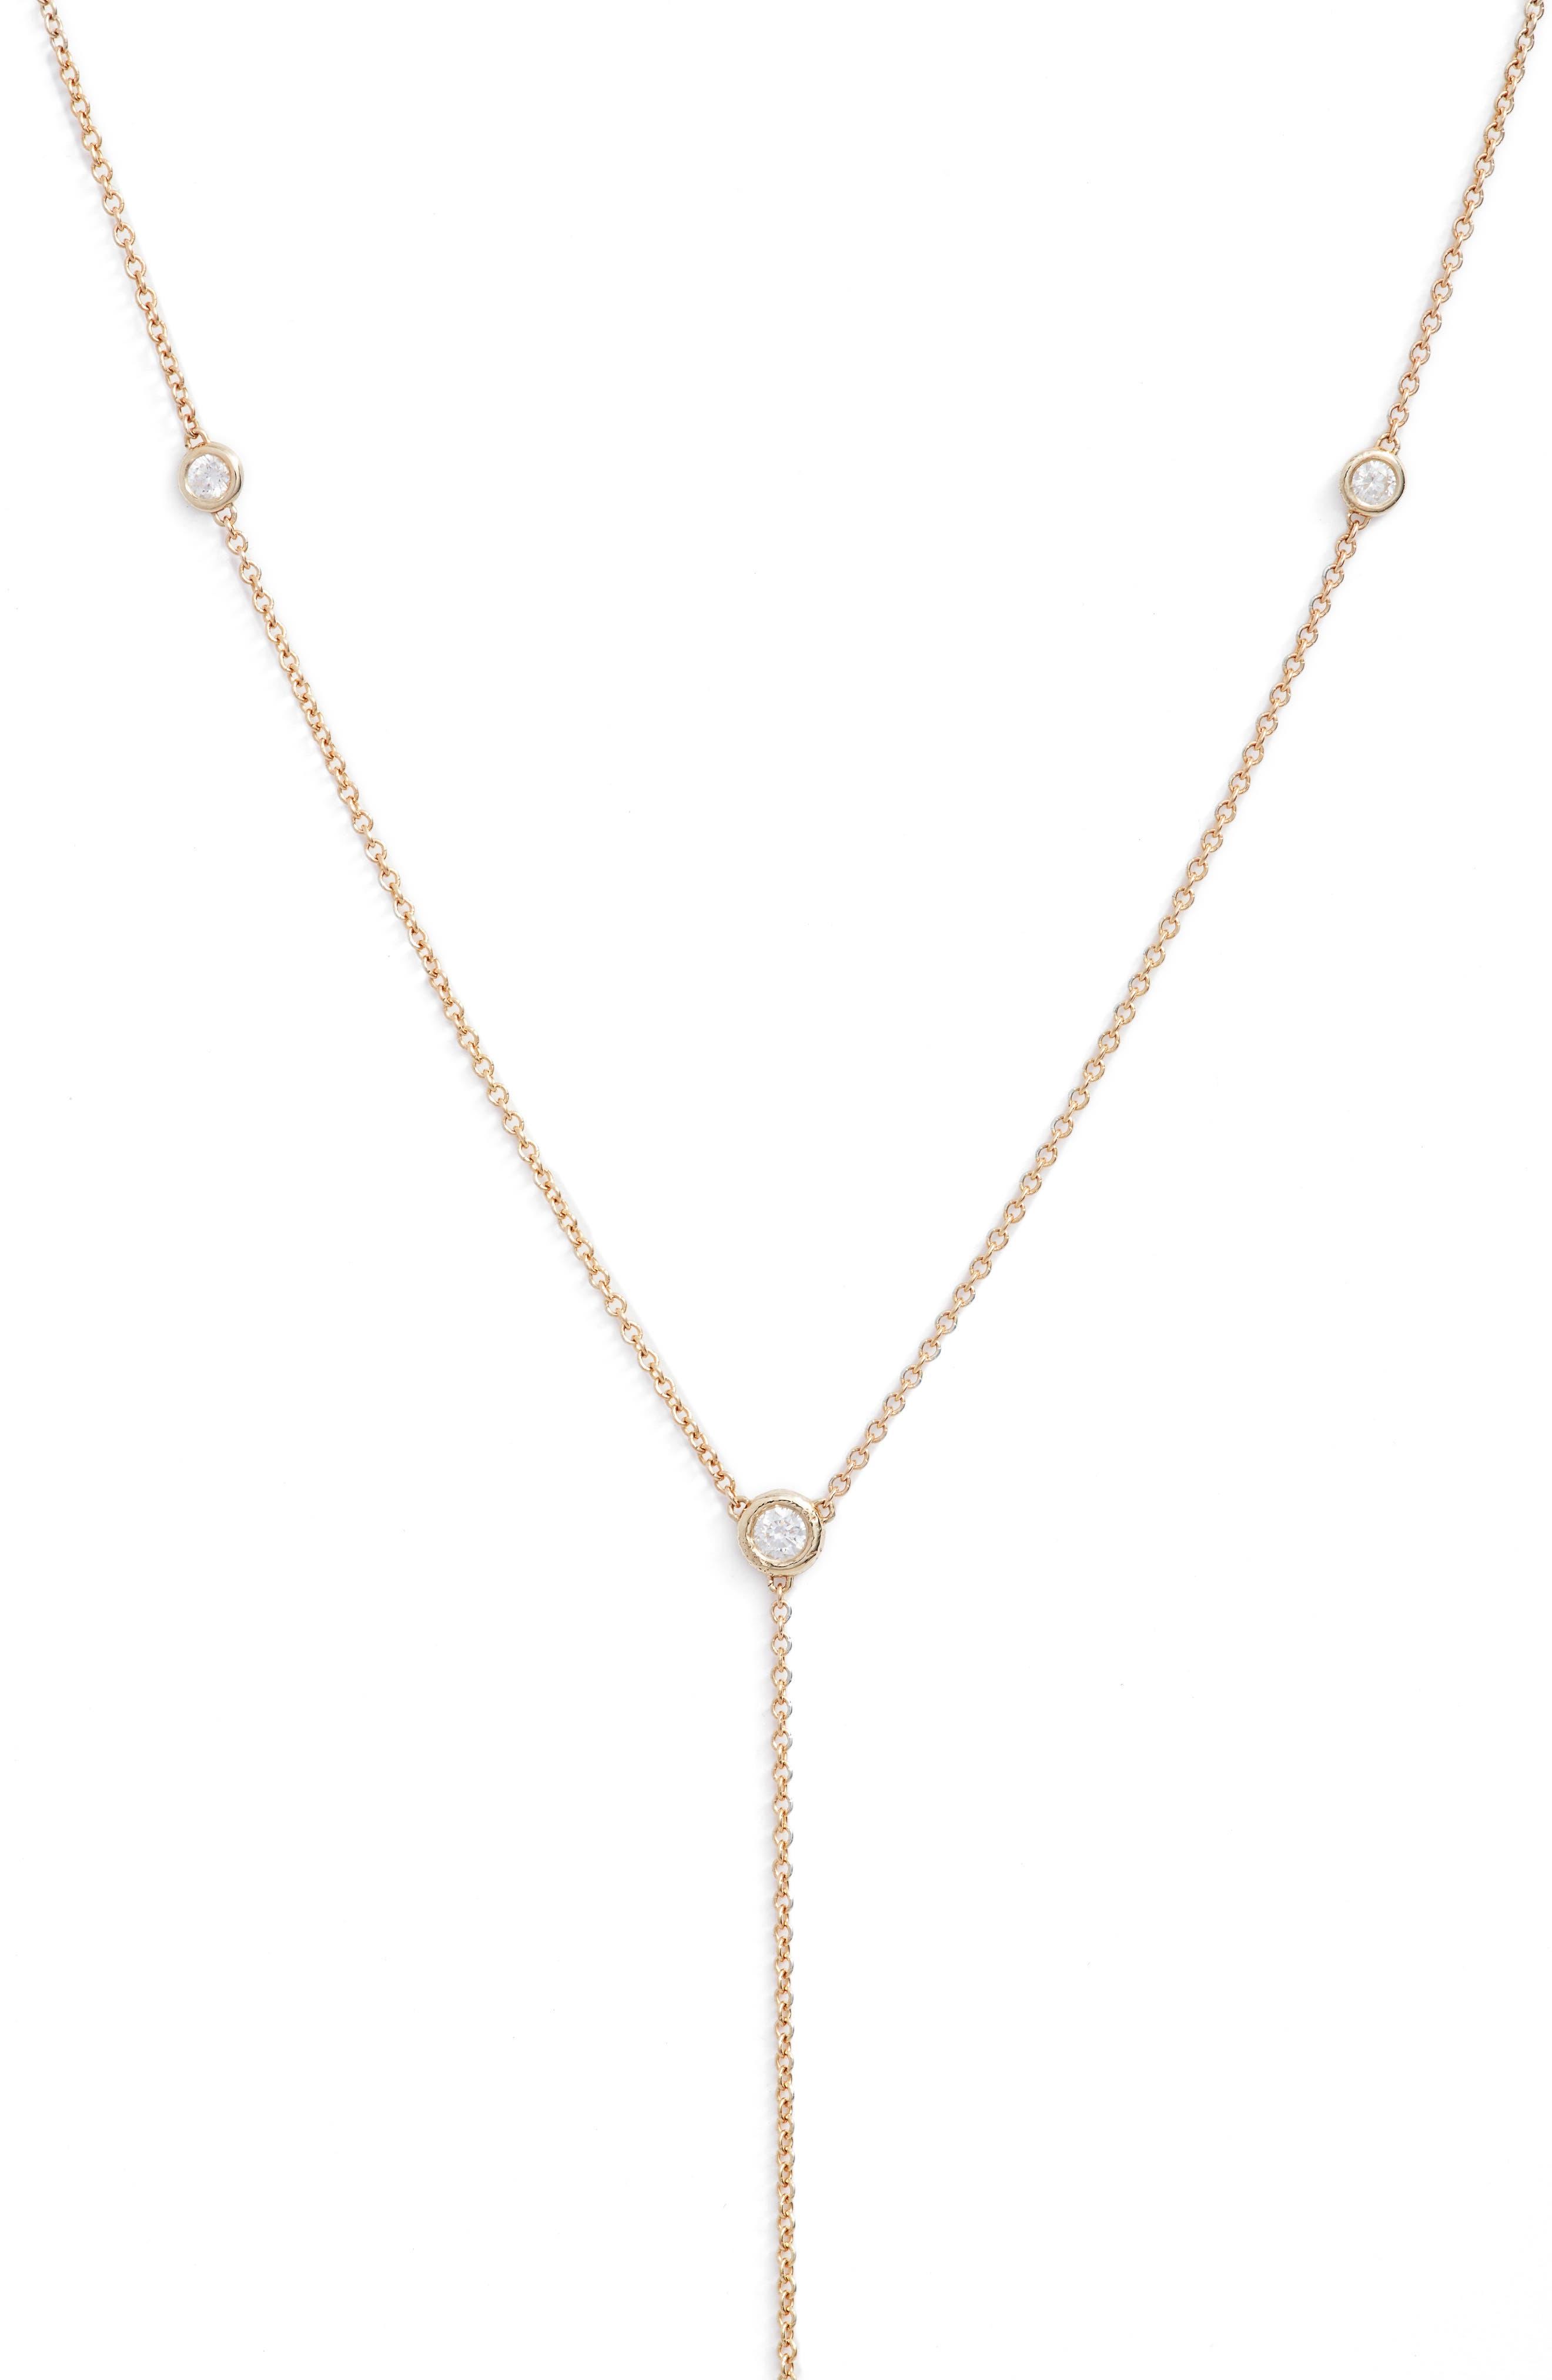 Main Image - Zoë Chicco Scattered Diamond Bezel Y-Necklace